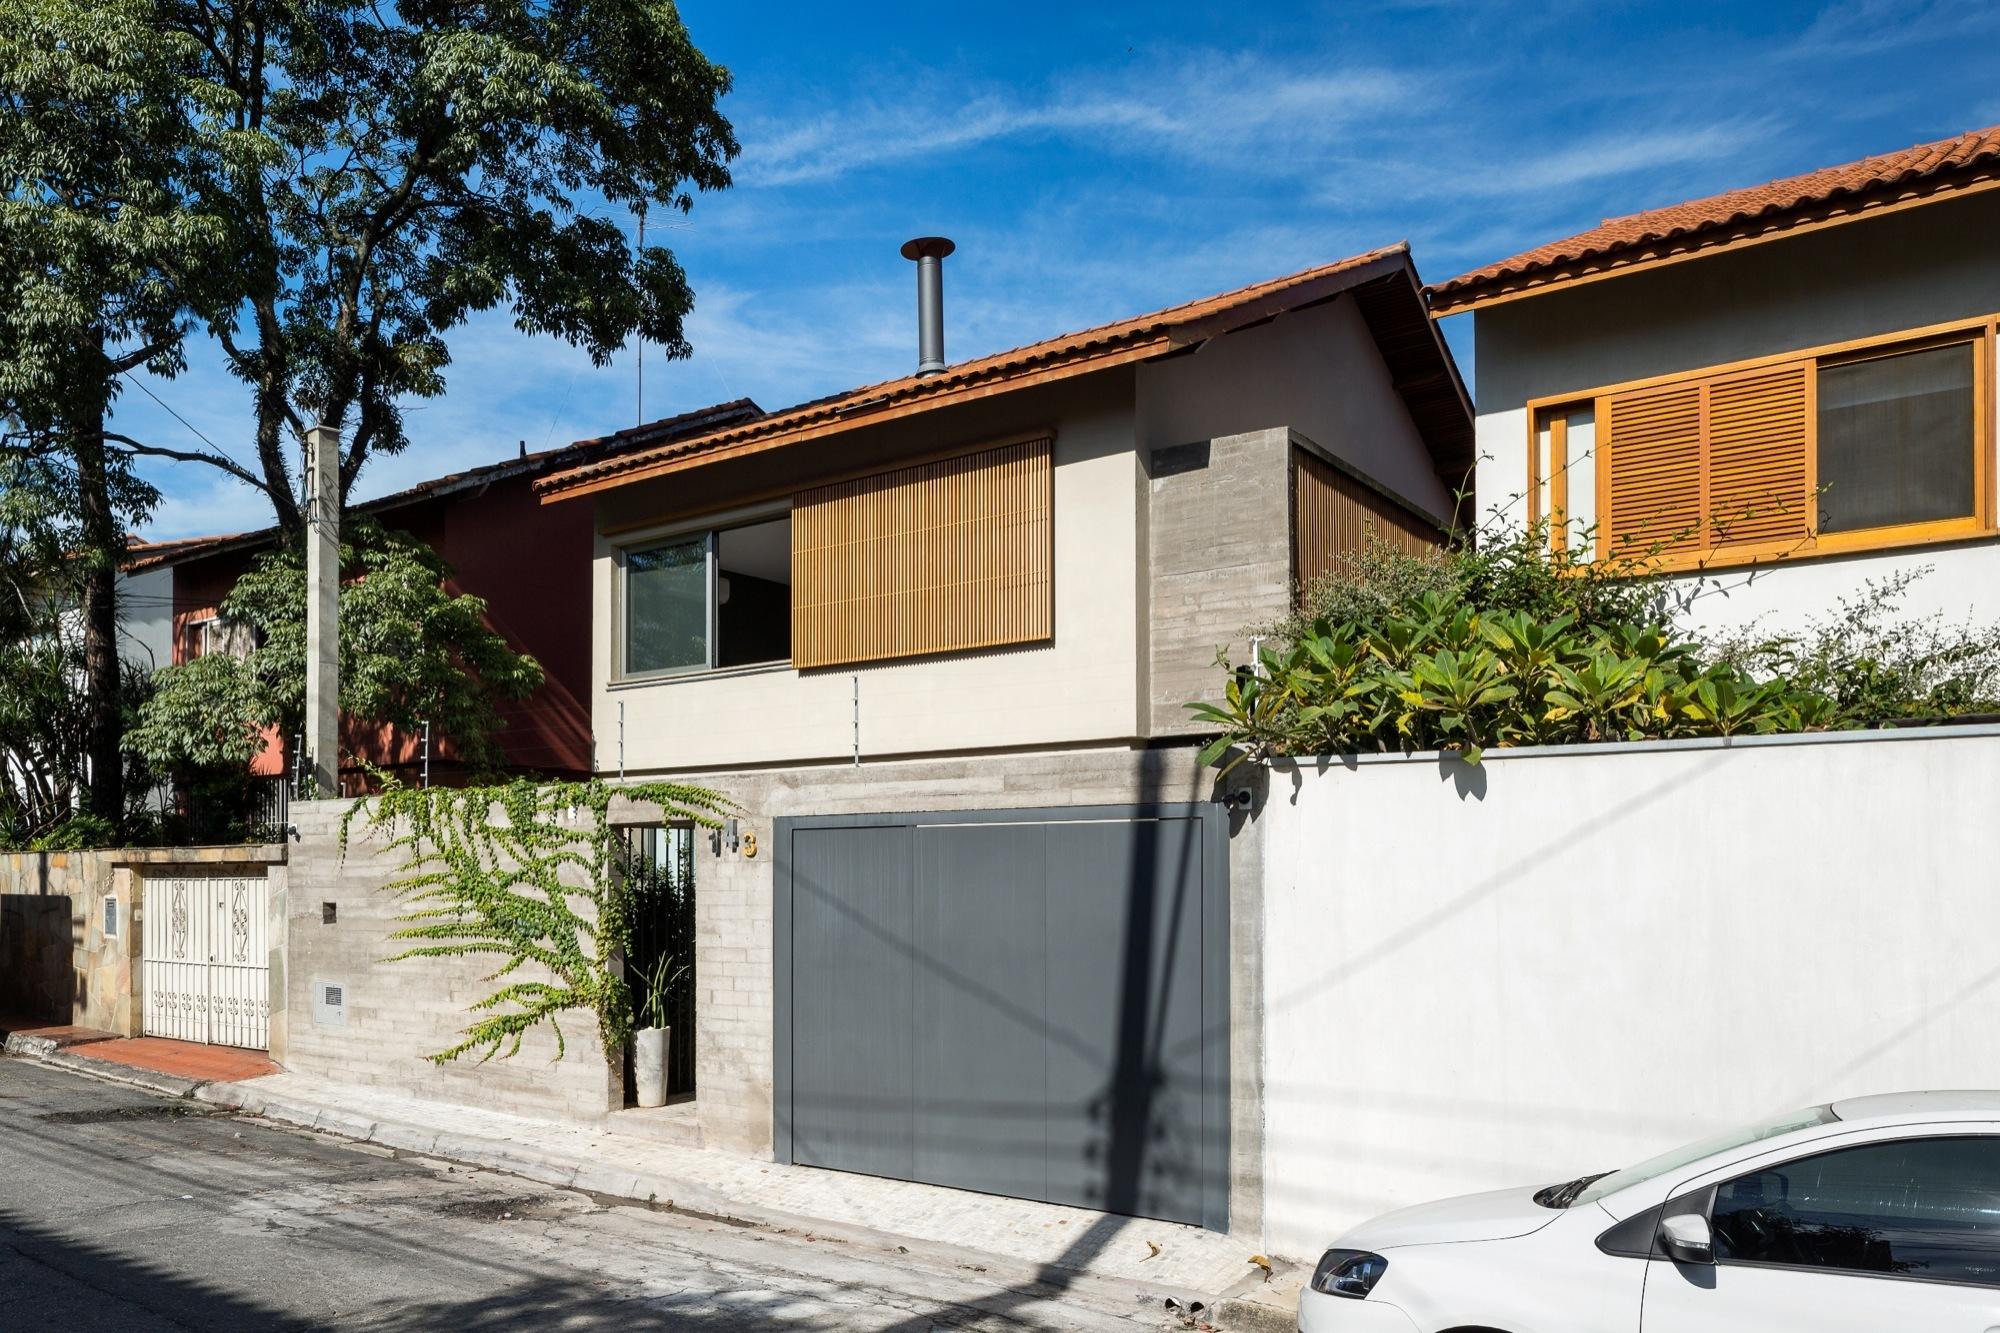 Galeria de casa sagarana rocco arquitetos 3 - The narrow house of sao paolo ...